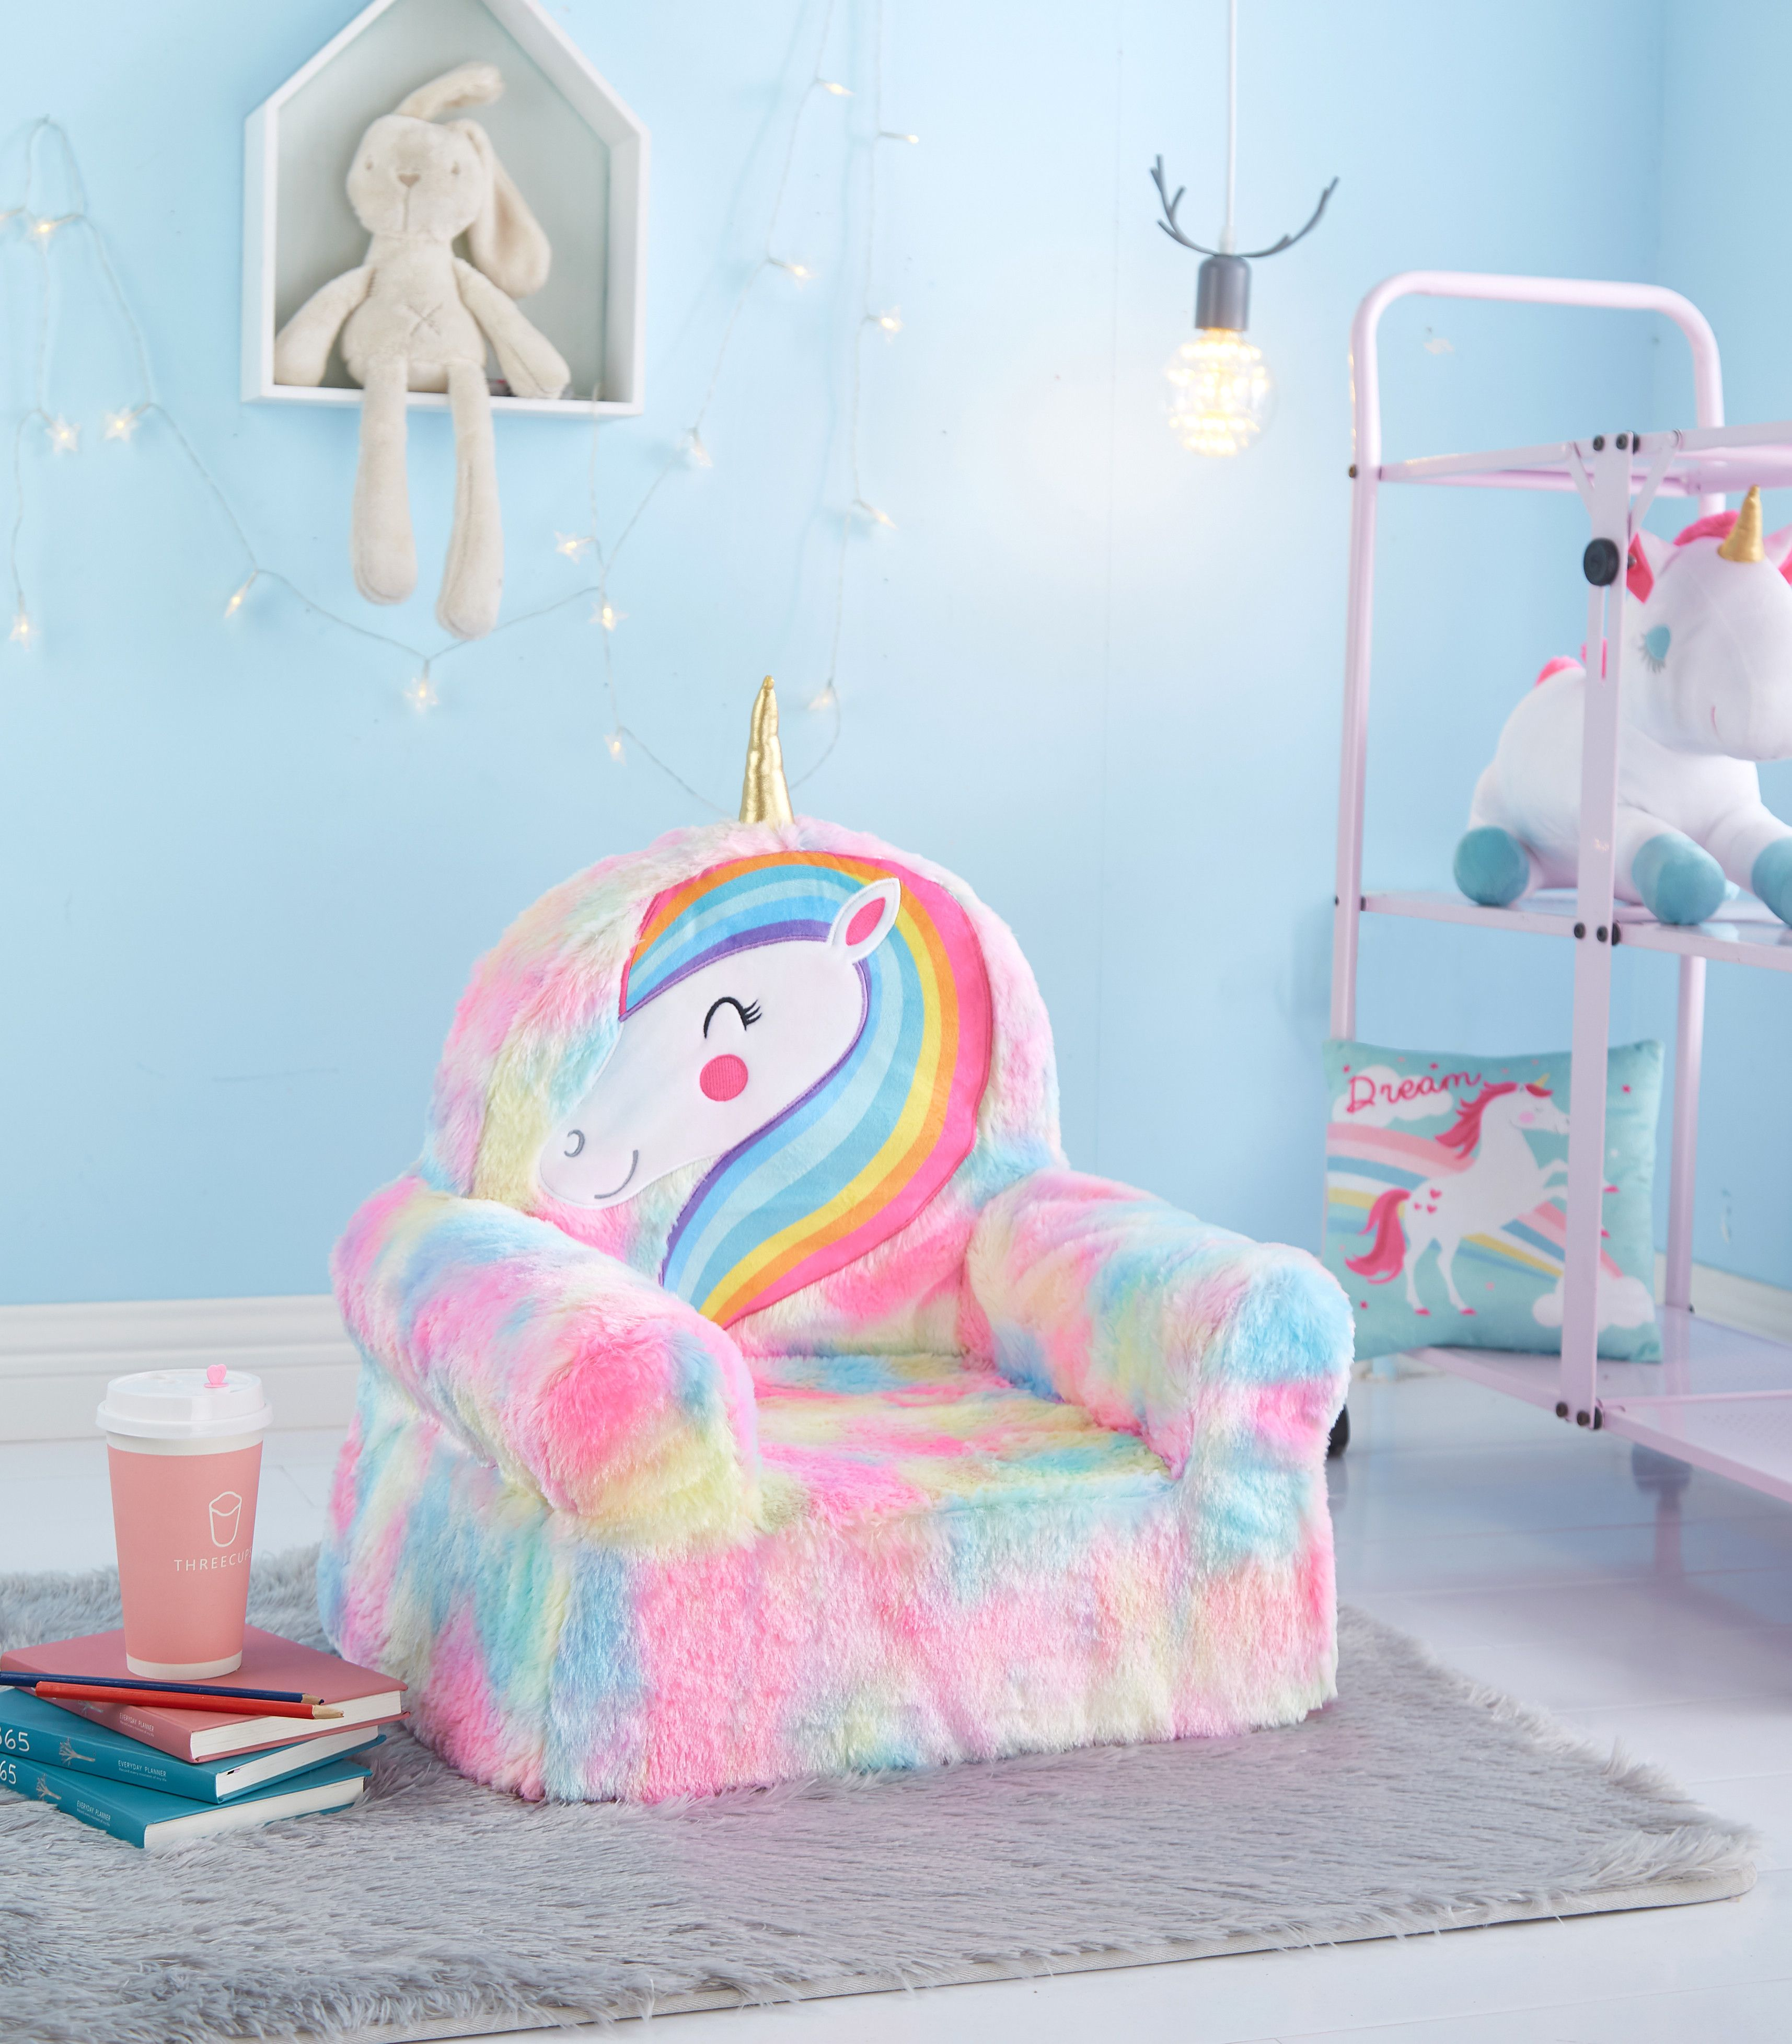 American Kids Figural Foam Chair Available In Multiple Styles Walmart Com In 2020 Girls Rainbow Bedroom Unicorn Room Decor Unicorn Bedroom Decor